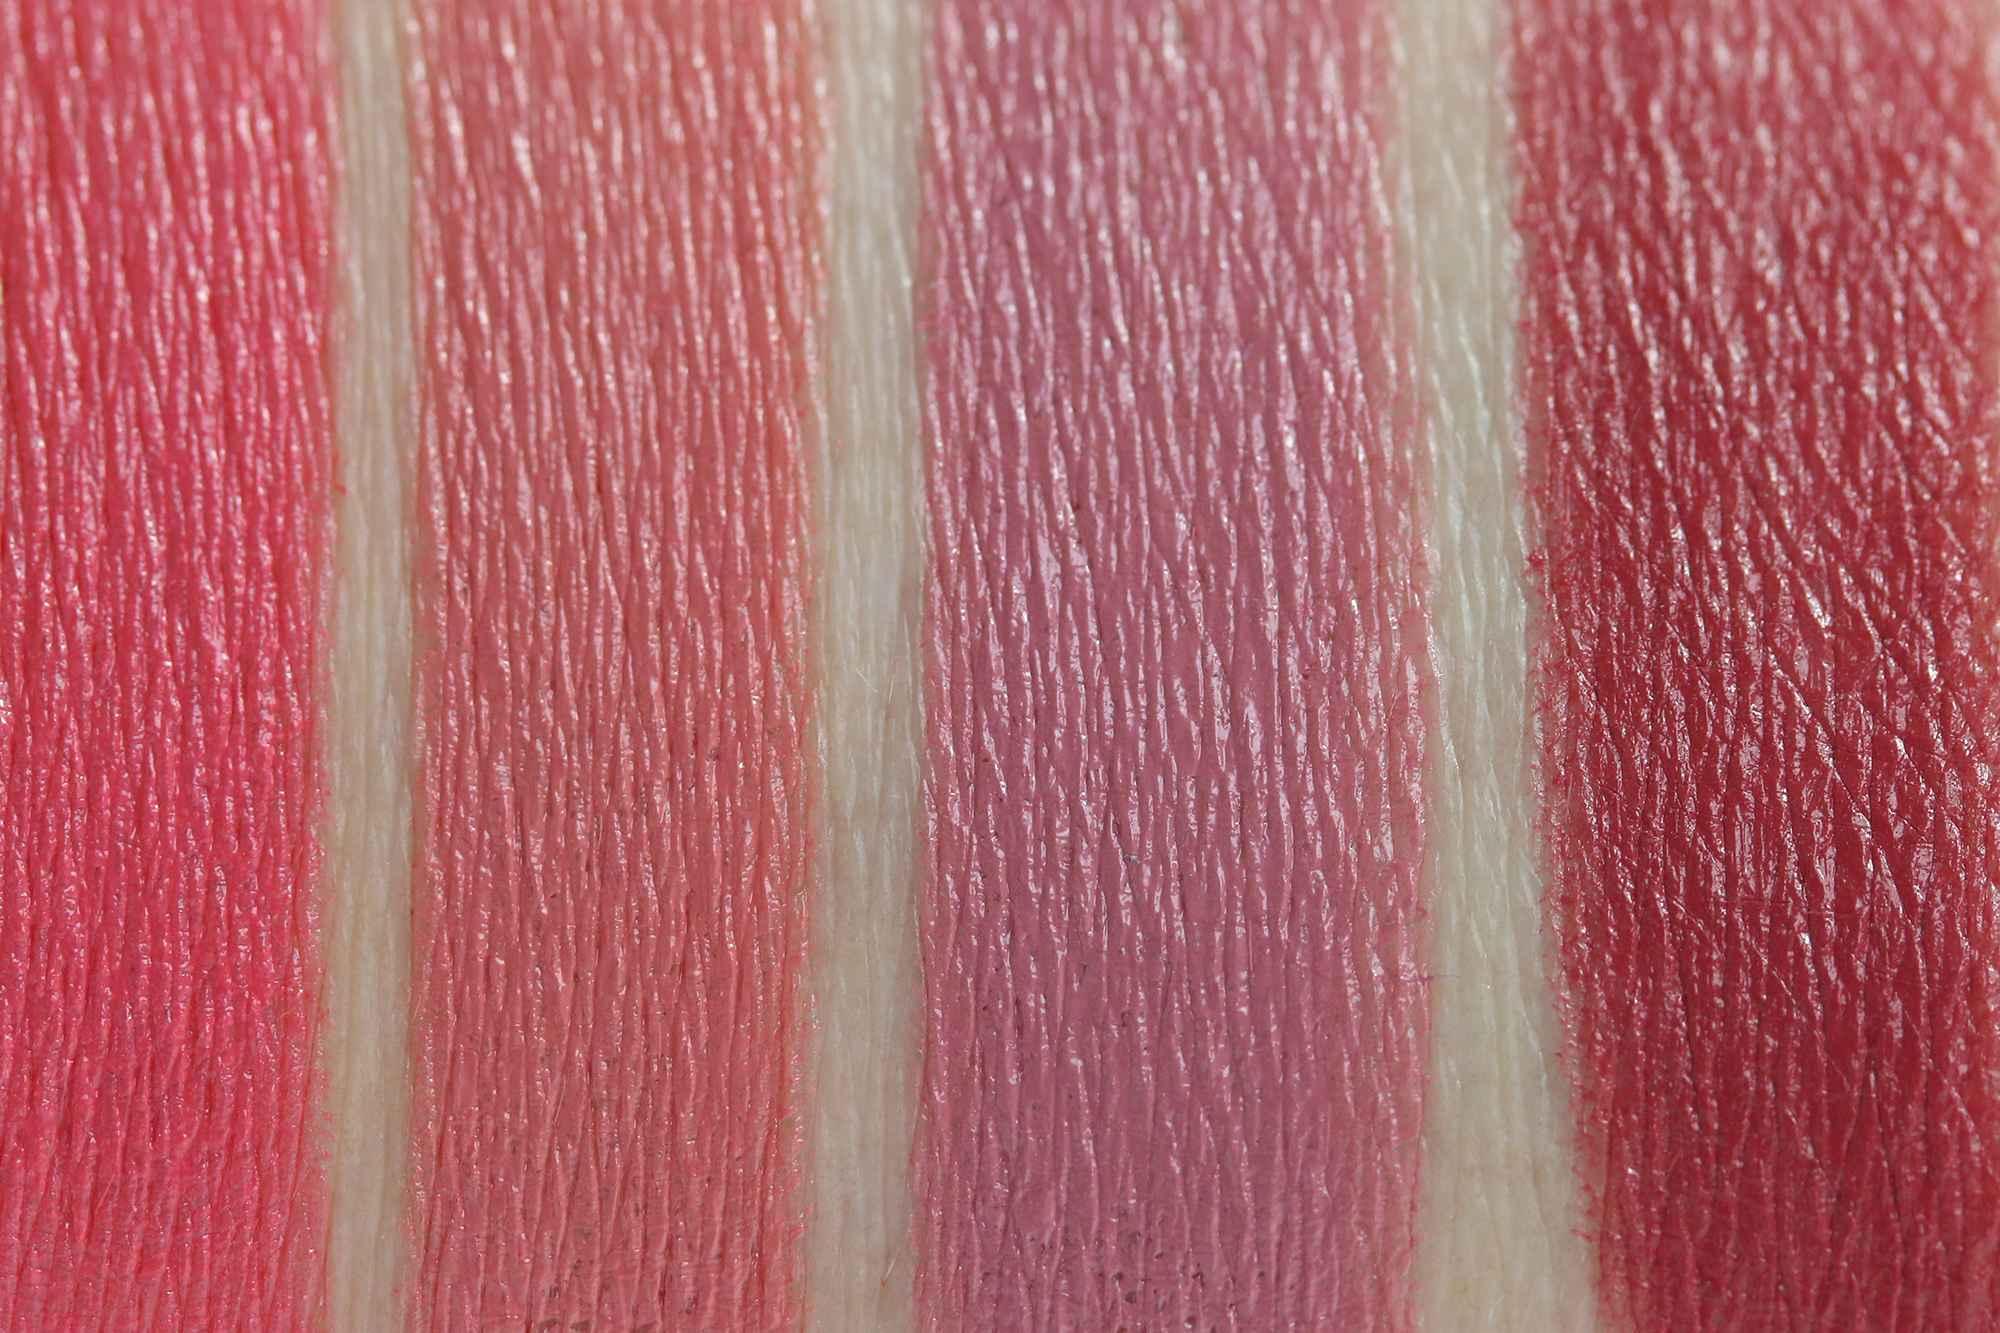 LIPaffair Color & Care Lippenstift Swatches InnenAussen 1